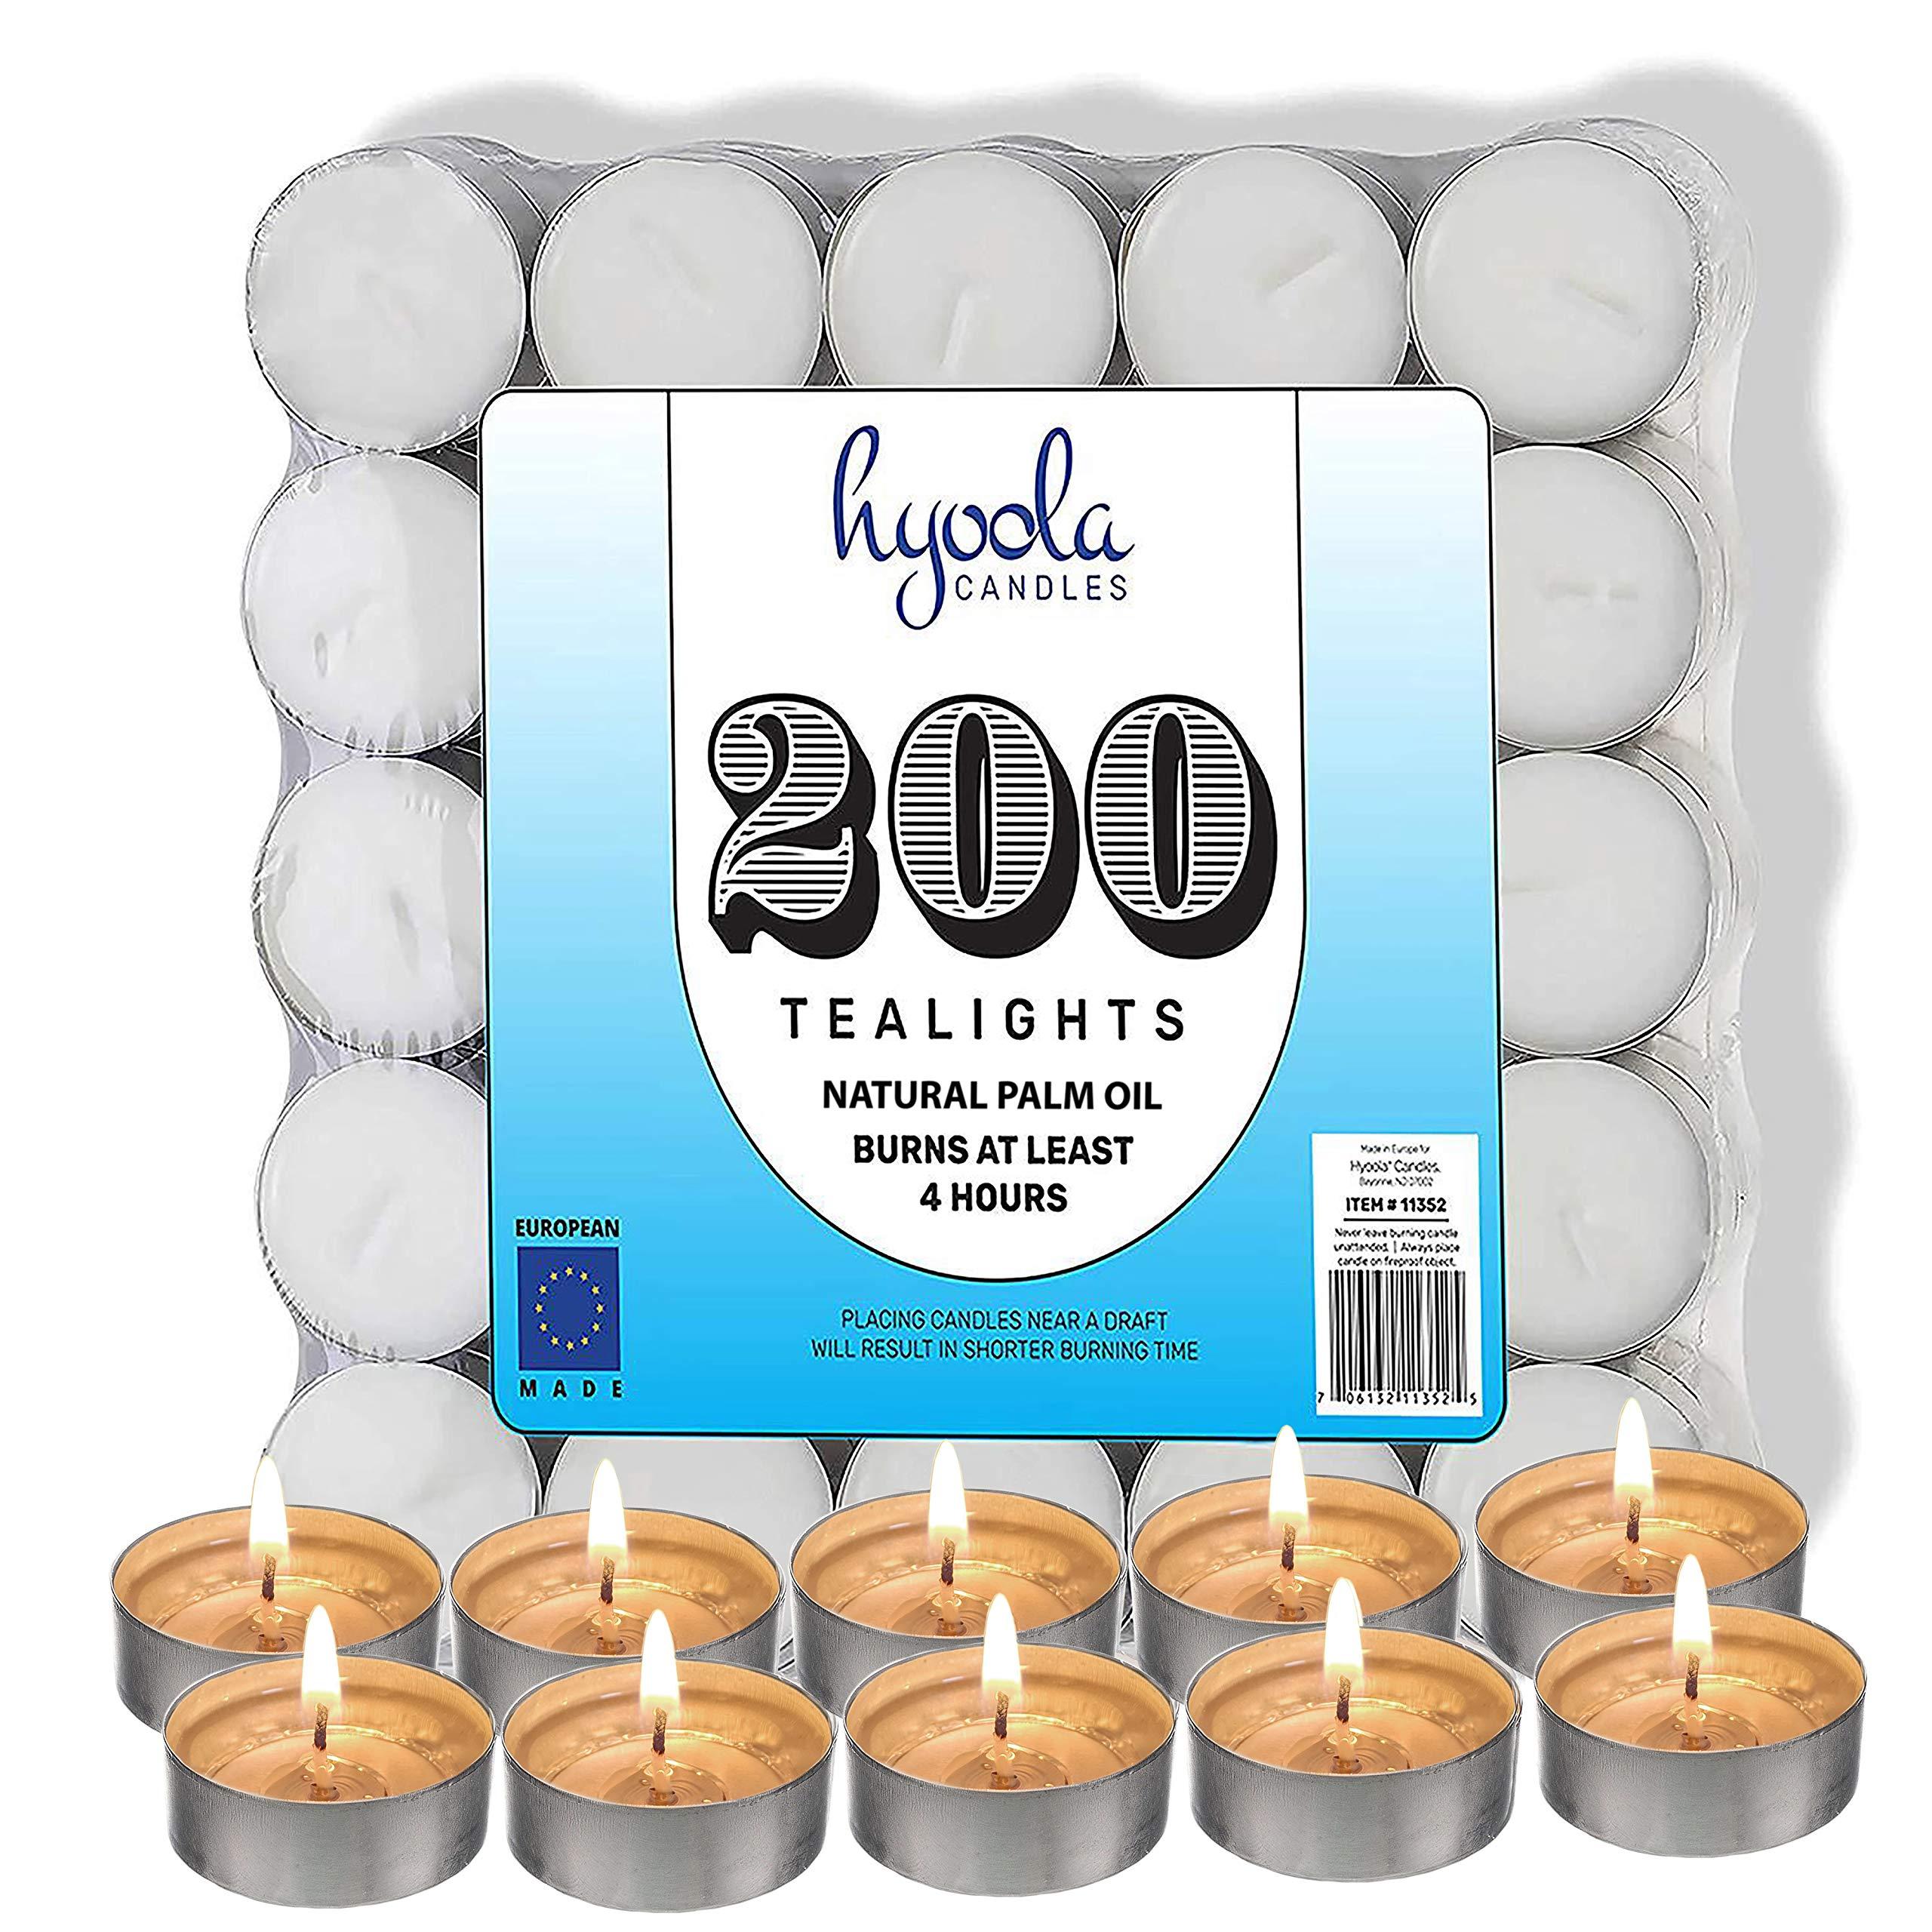 Hyoola Tea Lights Candles - 200 Bulk Candles Pack - Natural Palm Oil Tea Light - European Quality White Unscented Tealight Candles - 4 Hour Burn Time